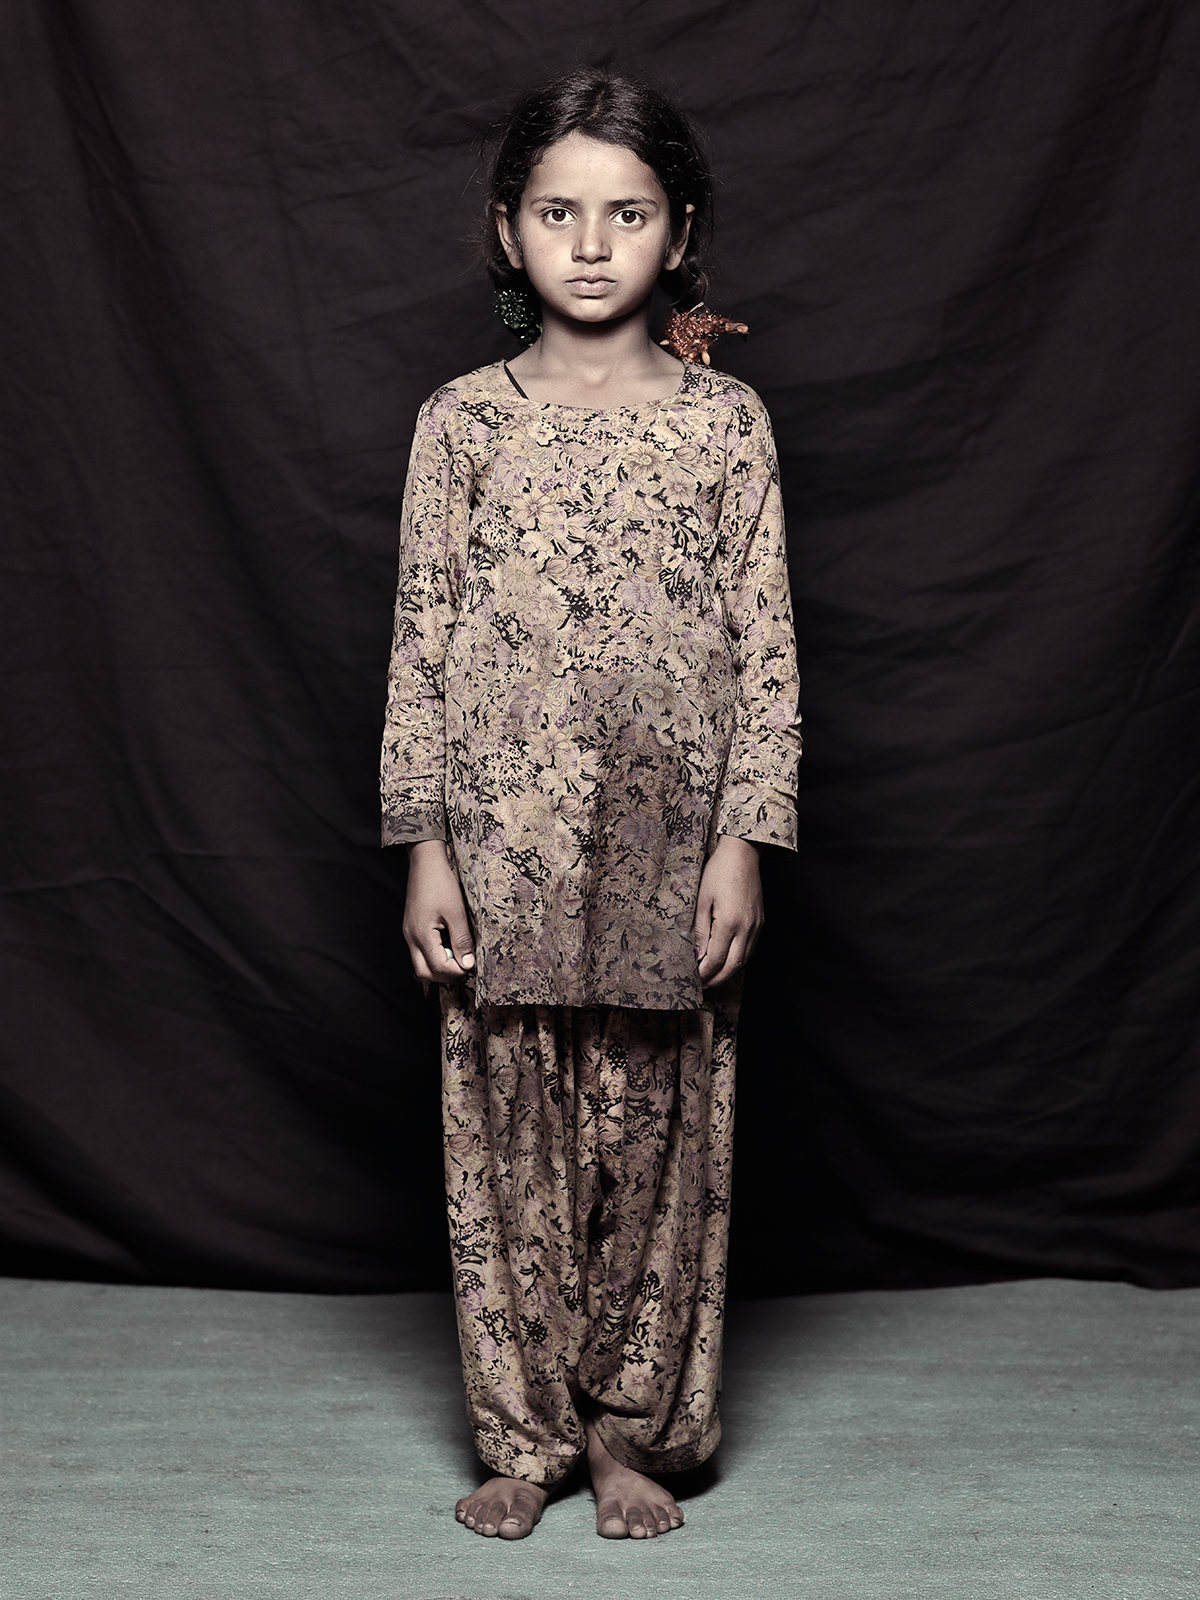 Heena Shah, 9, D-camp, 2013